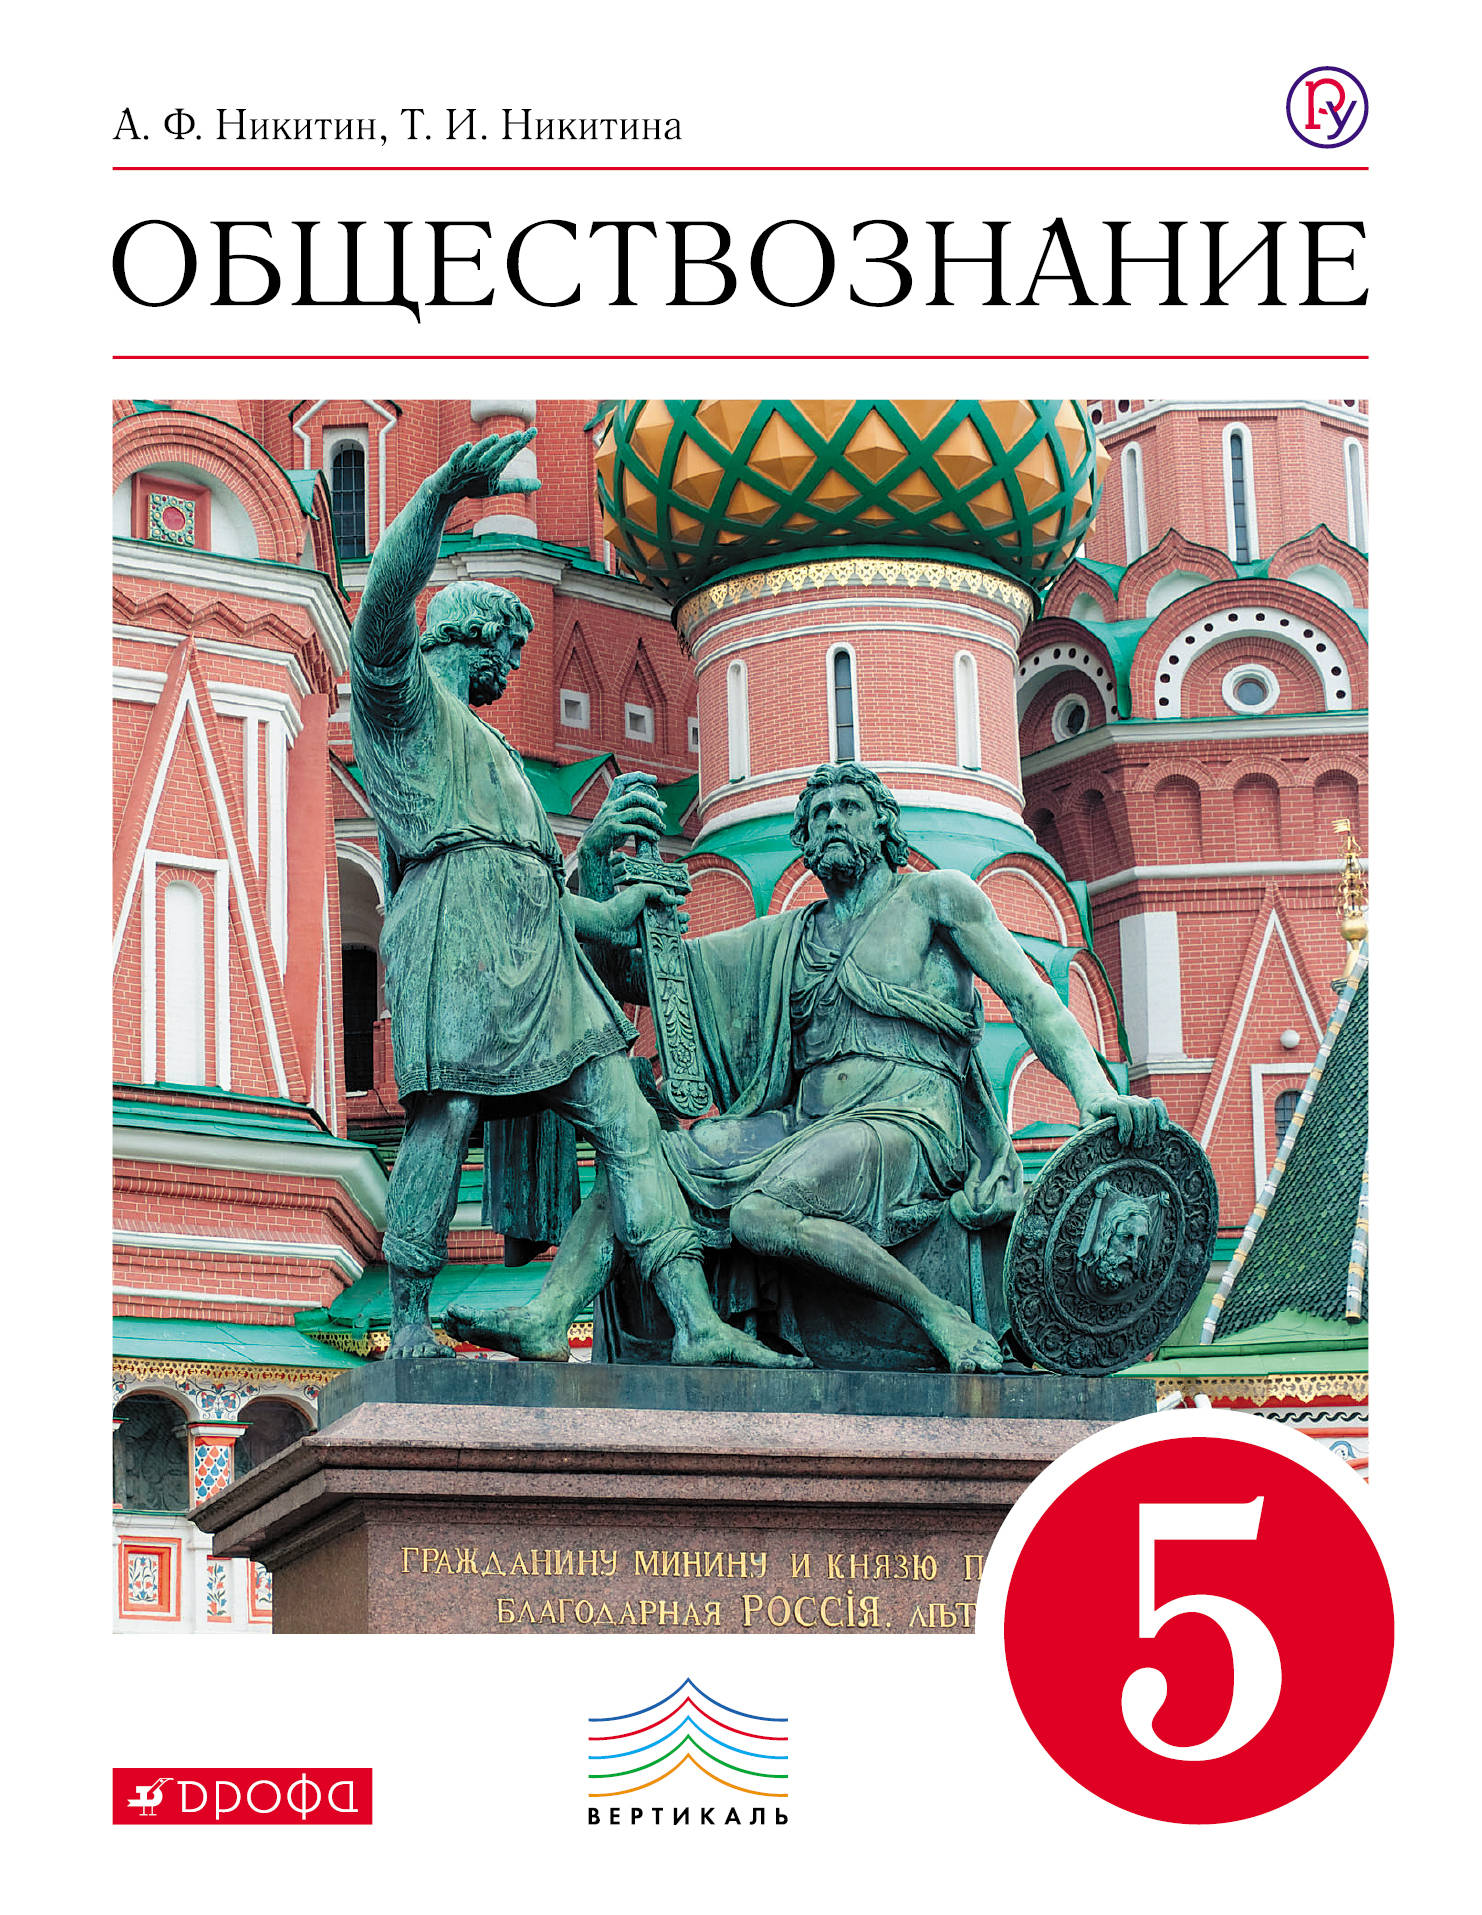 А.Ф. Никитин, Т.И. Никитина Обществознание. 5 класс. Учебник.